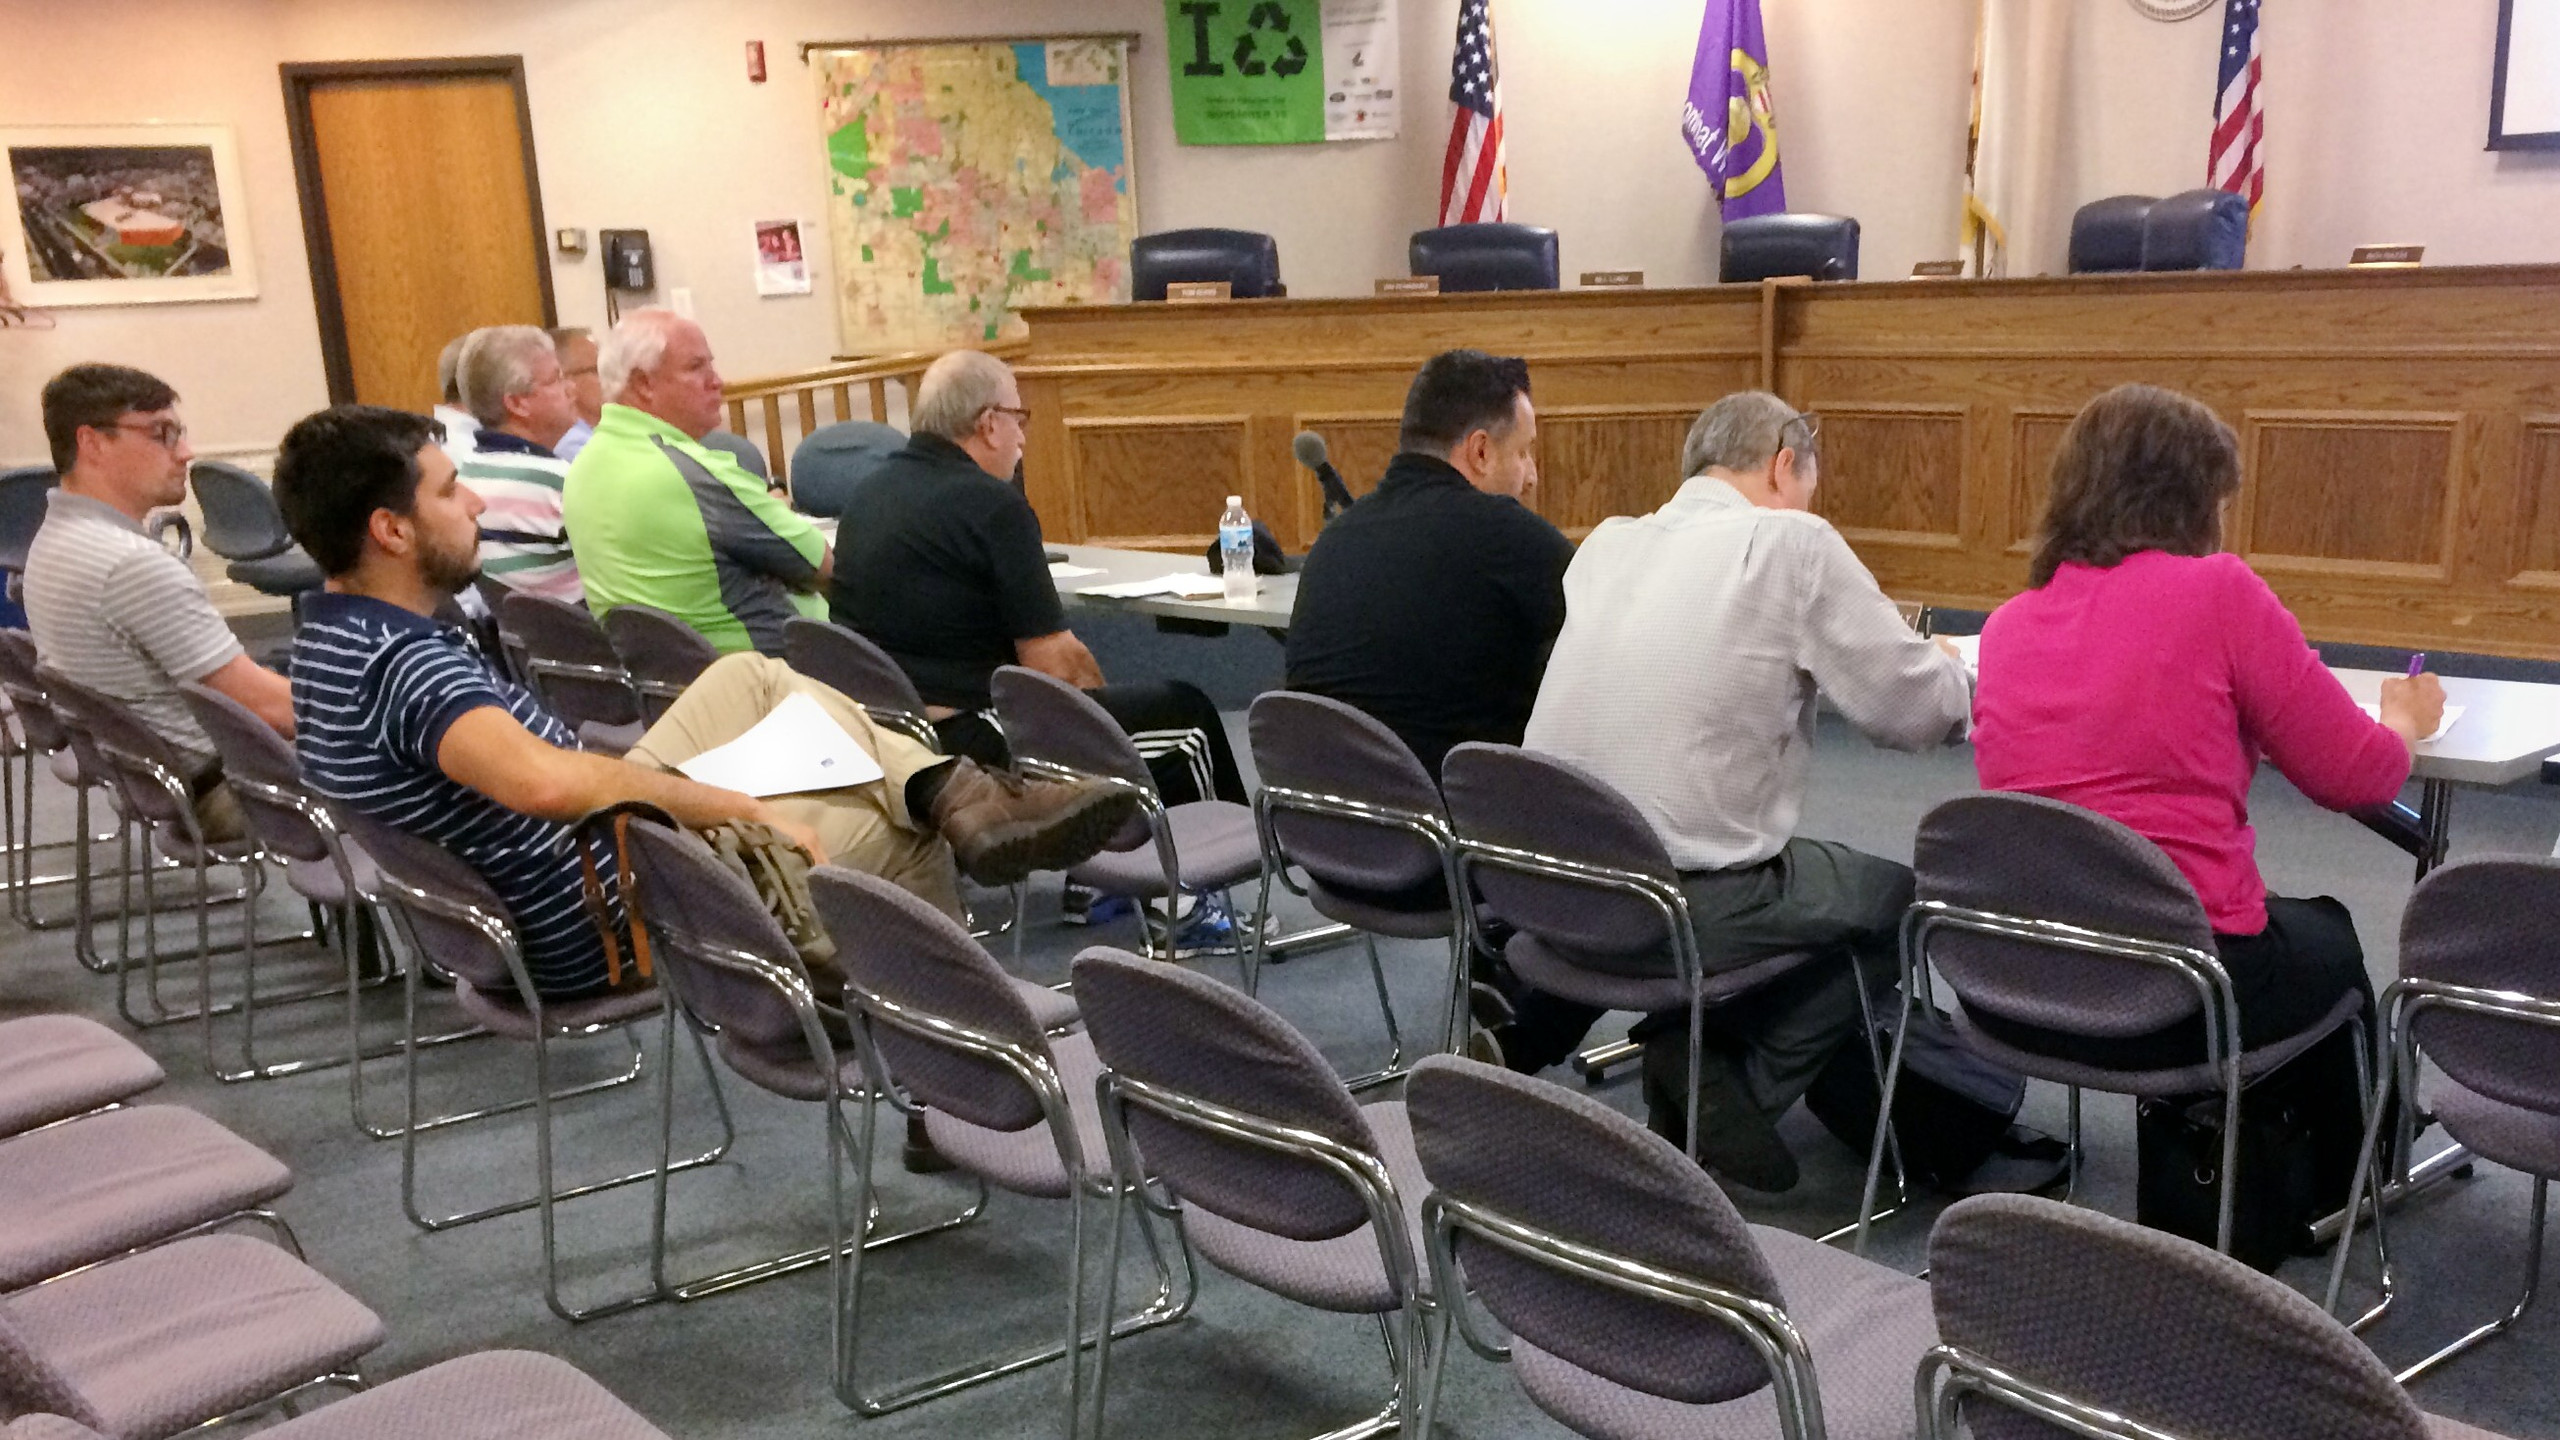 Oak Lawn Plan Commissioner Training August 6, 2018, with Laurie Marston, FAICP & Bob Sullivan, FAICP